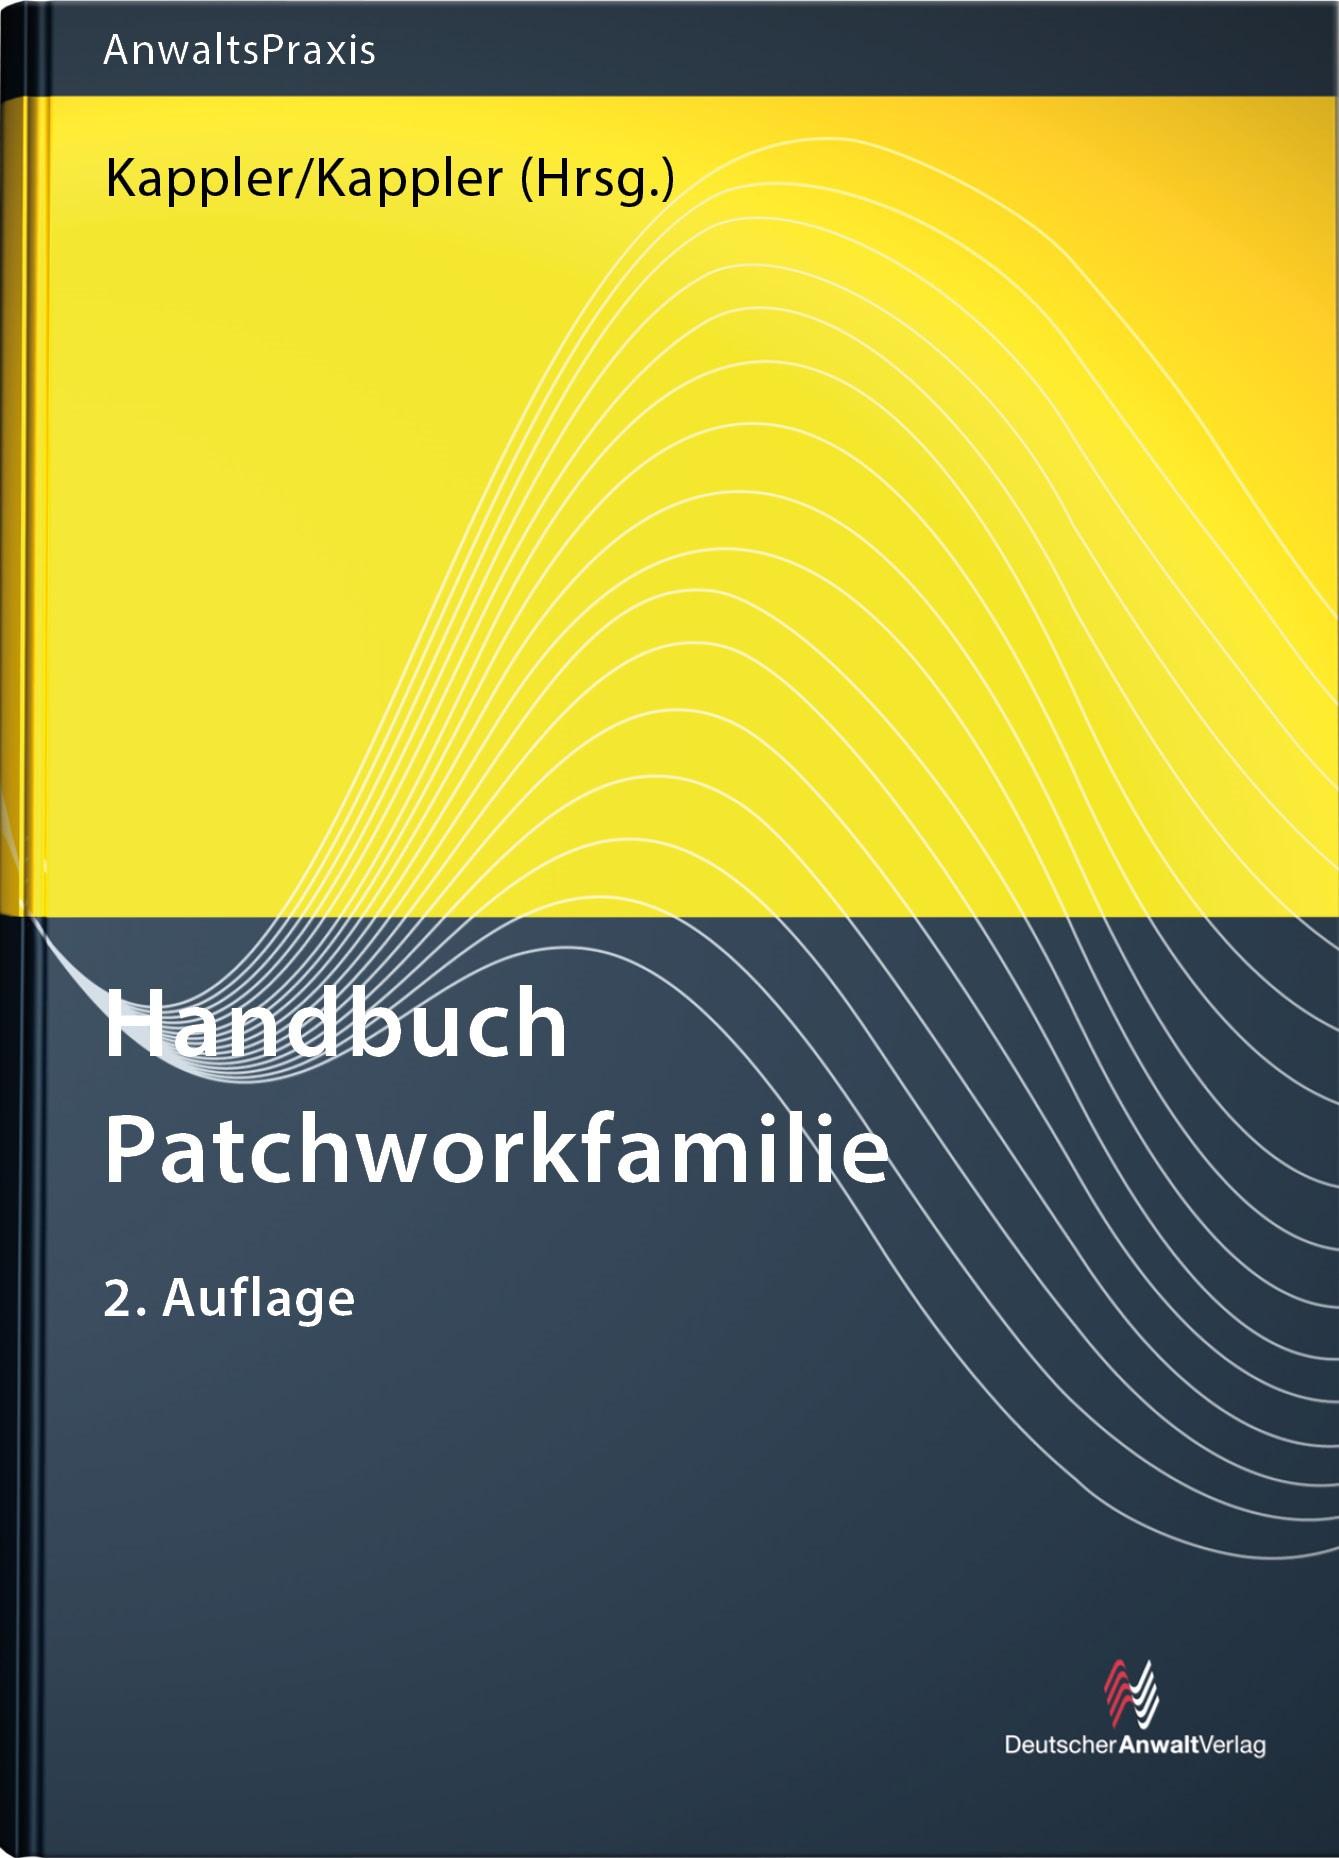 Handbuch Patchworkfamilie | Kappler / Kappler (Hrsg.) | 2. Auflage., 2017 | Buch (Cover)